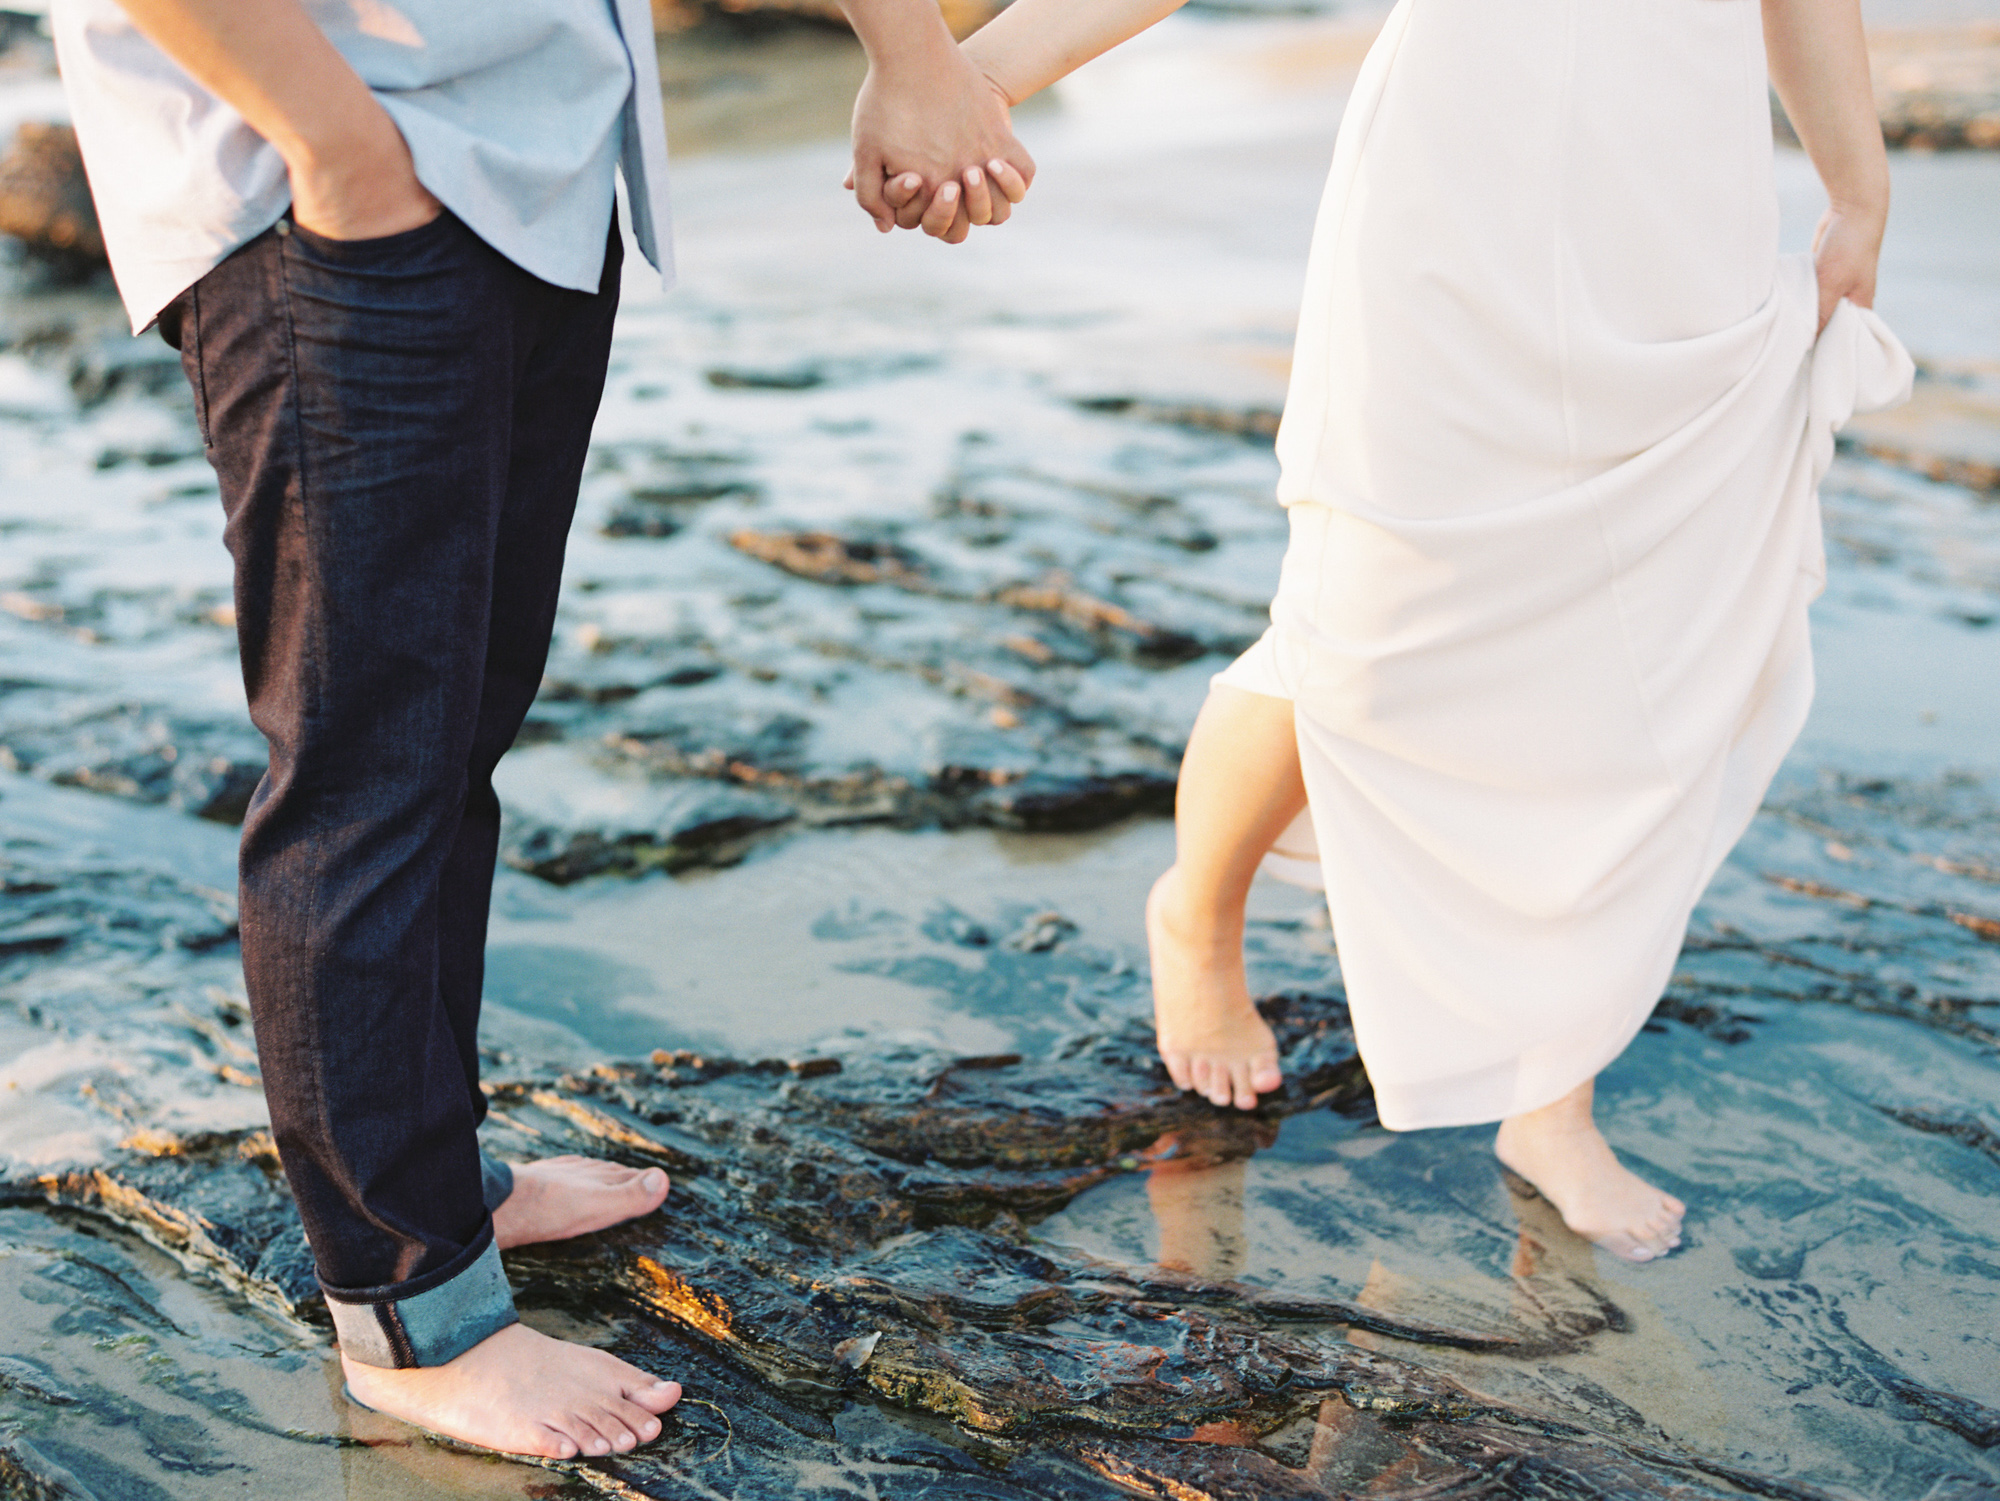 Crystal-Cove-Engagement-Kristina-Adams-13.jpg